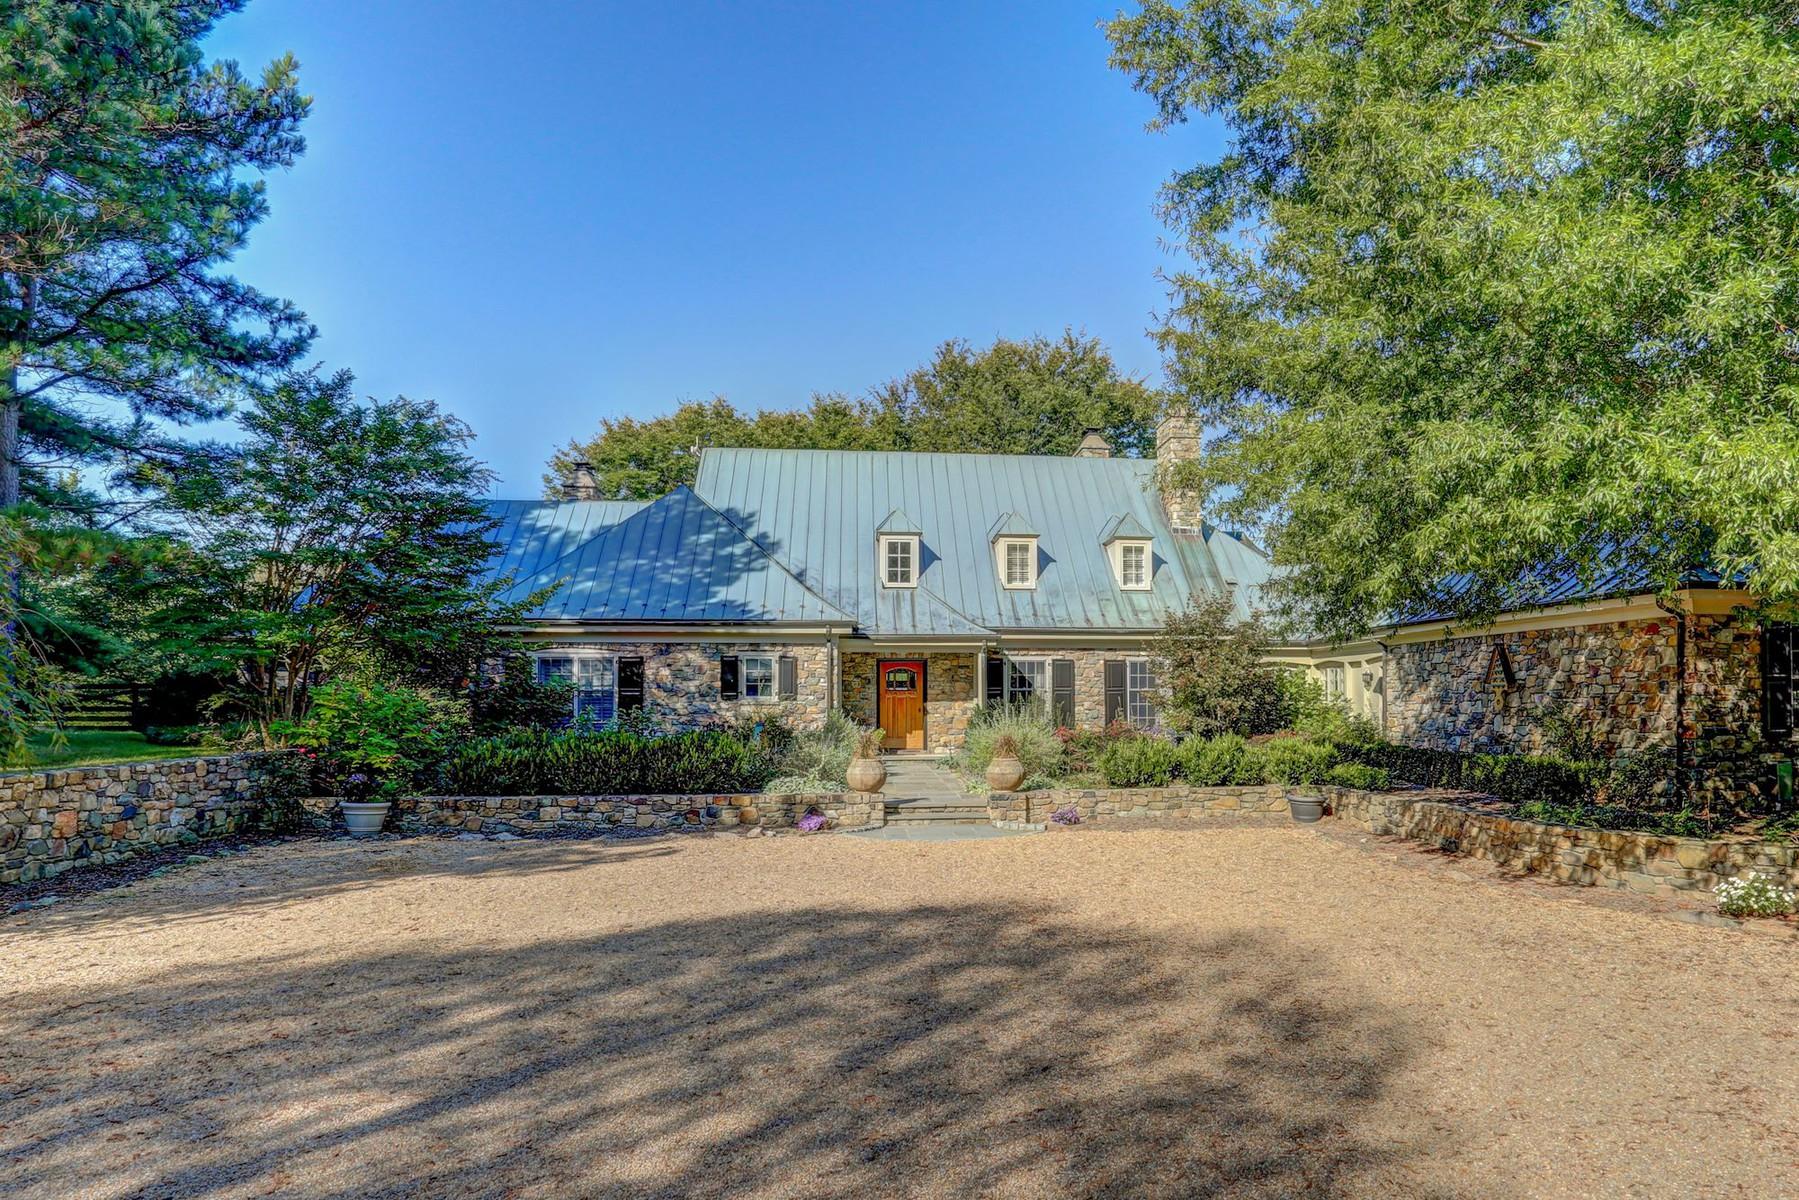 Single Family Home for Sale at 2380 Atoka Road, Marshall 2380 Atoka Rd Marshall, Virginia 20115 United States